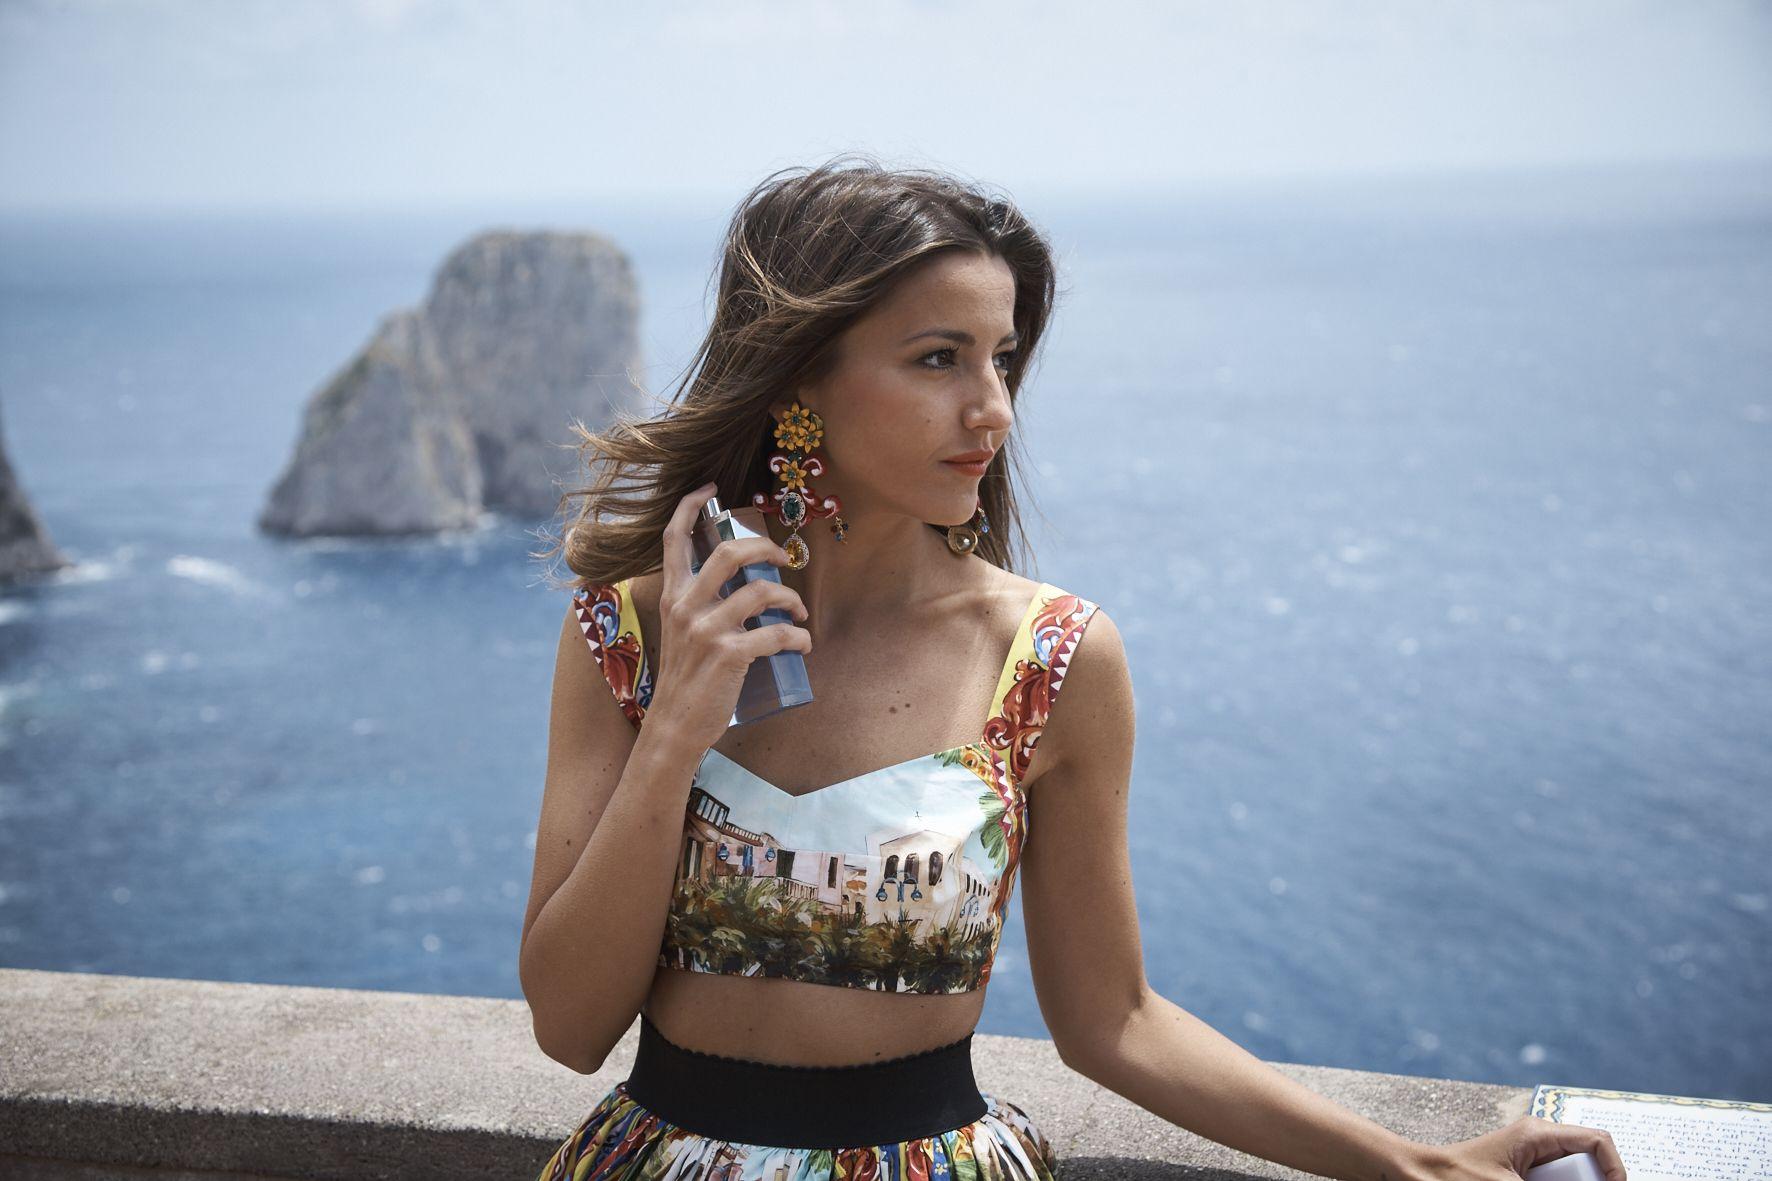 Breathing the atmosphere of an Italian summer: Love in Capri, the new  #DGlightblue women's fragrance #lightbluejou… | Dolce and gabbana, Women,  Dolce gabbana jacket